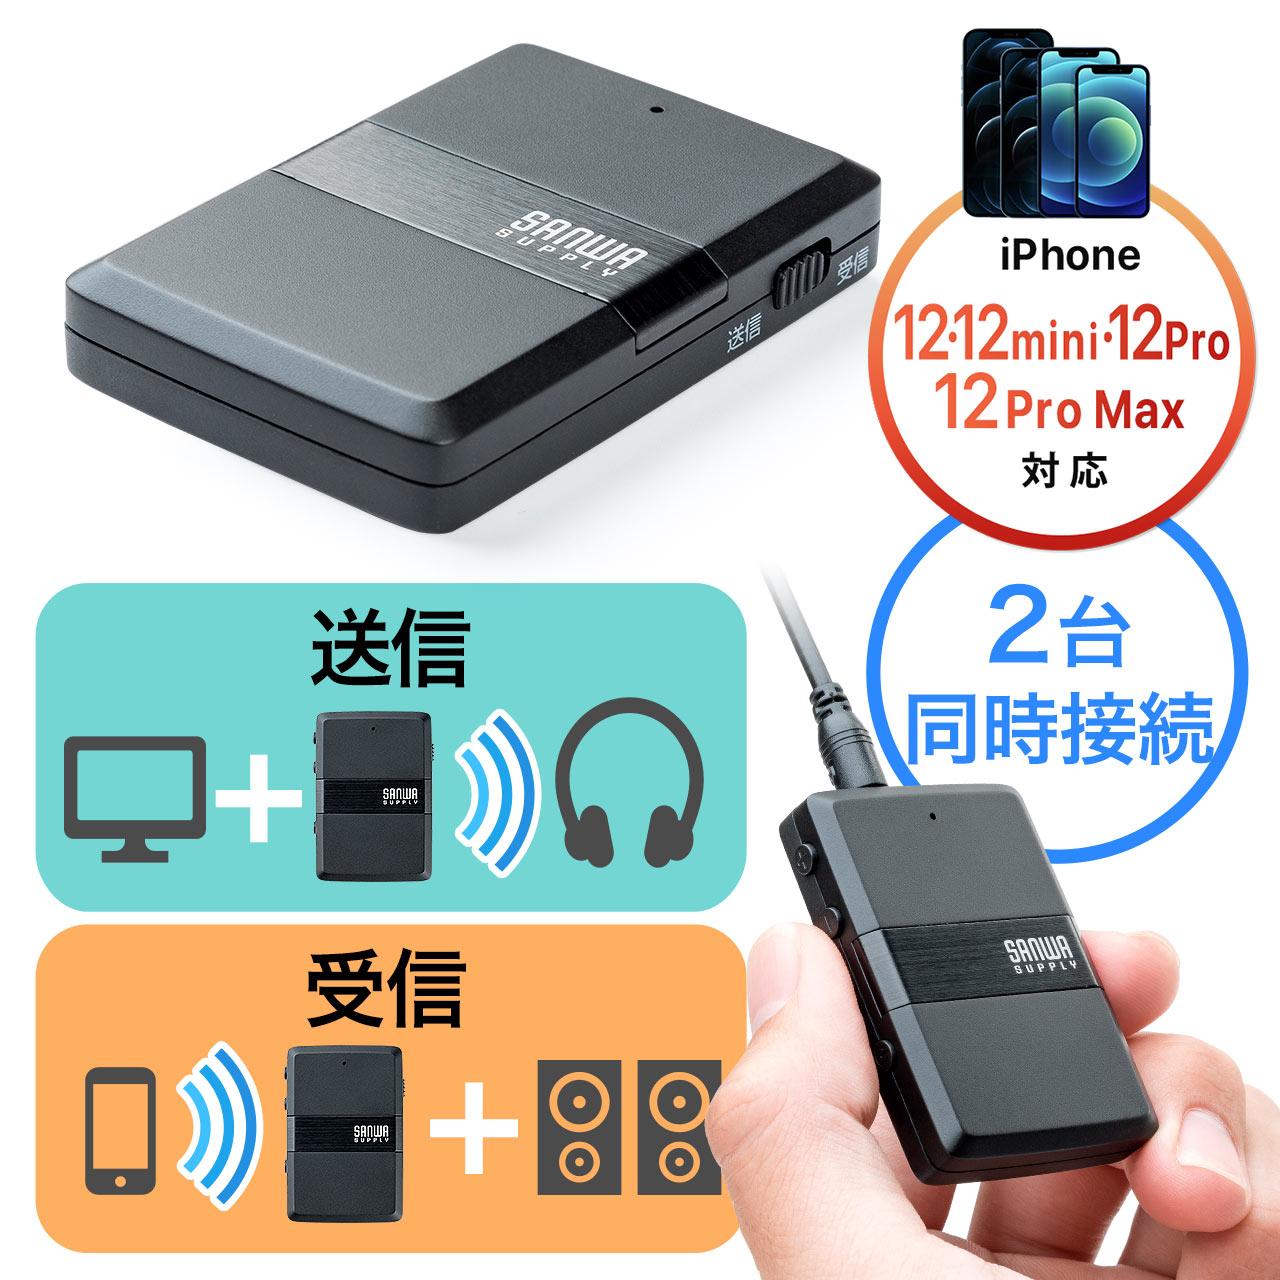 Bluetoothオーディオトランスミッター&レシーバー(apt-X Low Latency対応・低遅延・2台同時接続) サンワダイレクト サンワサプライ ..